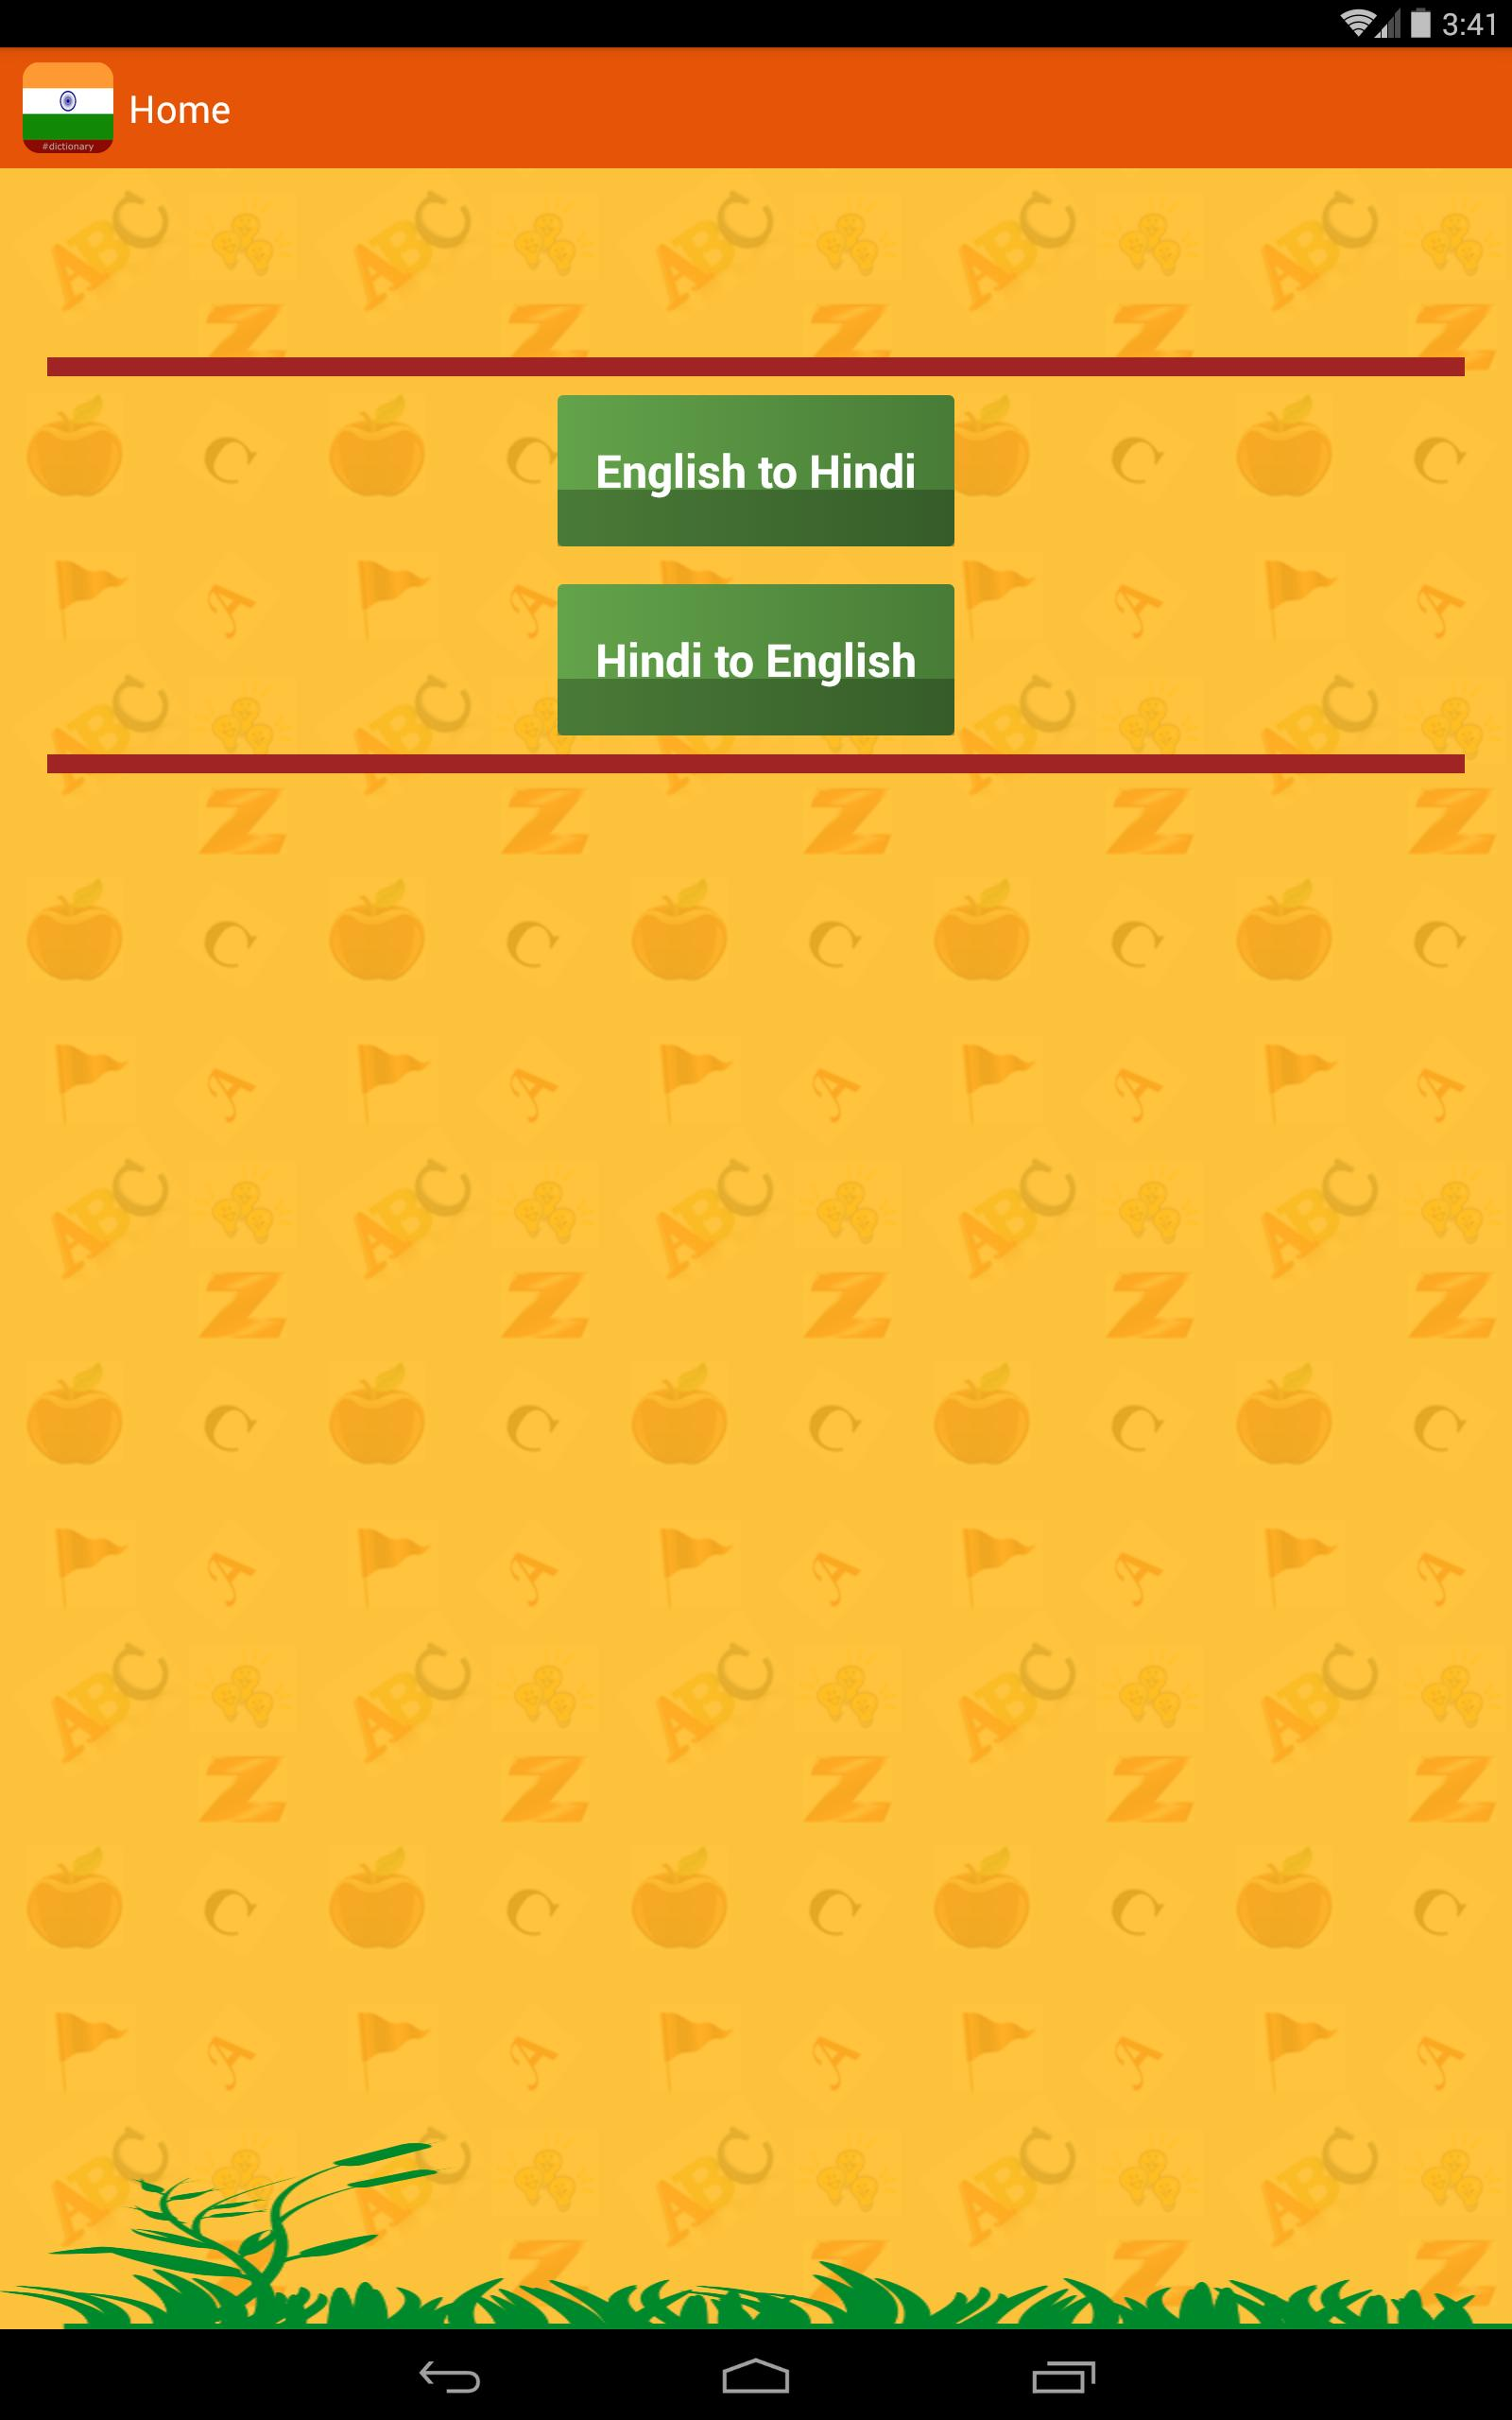 Sinhala English Translator for Android - APK Download